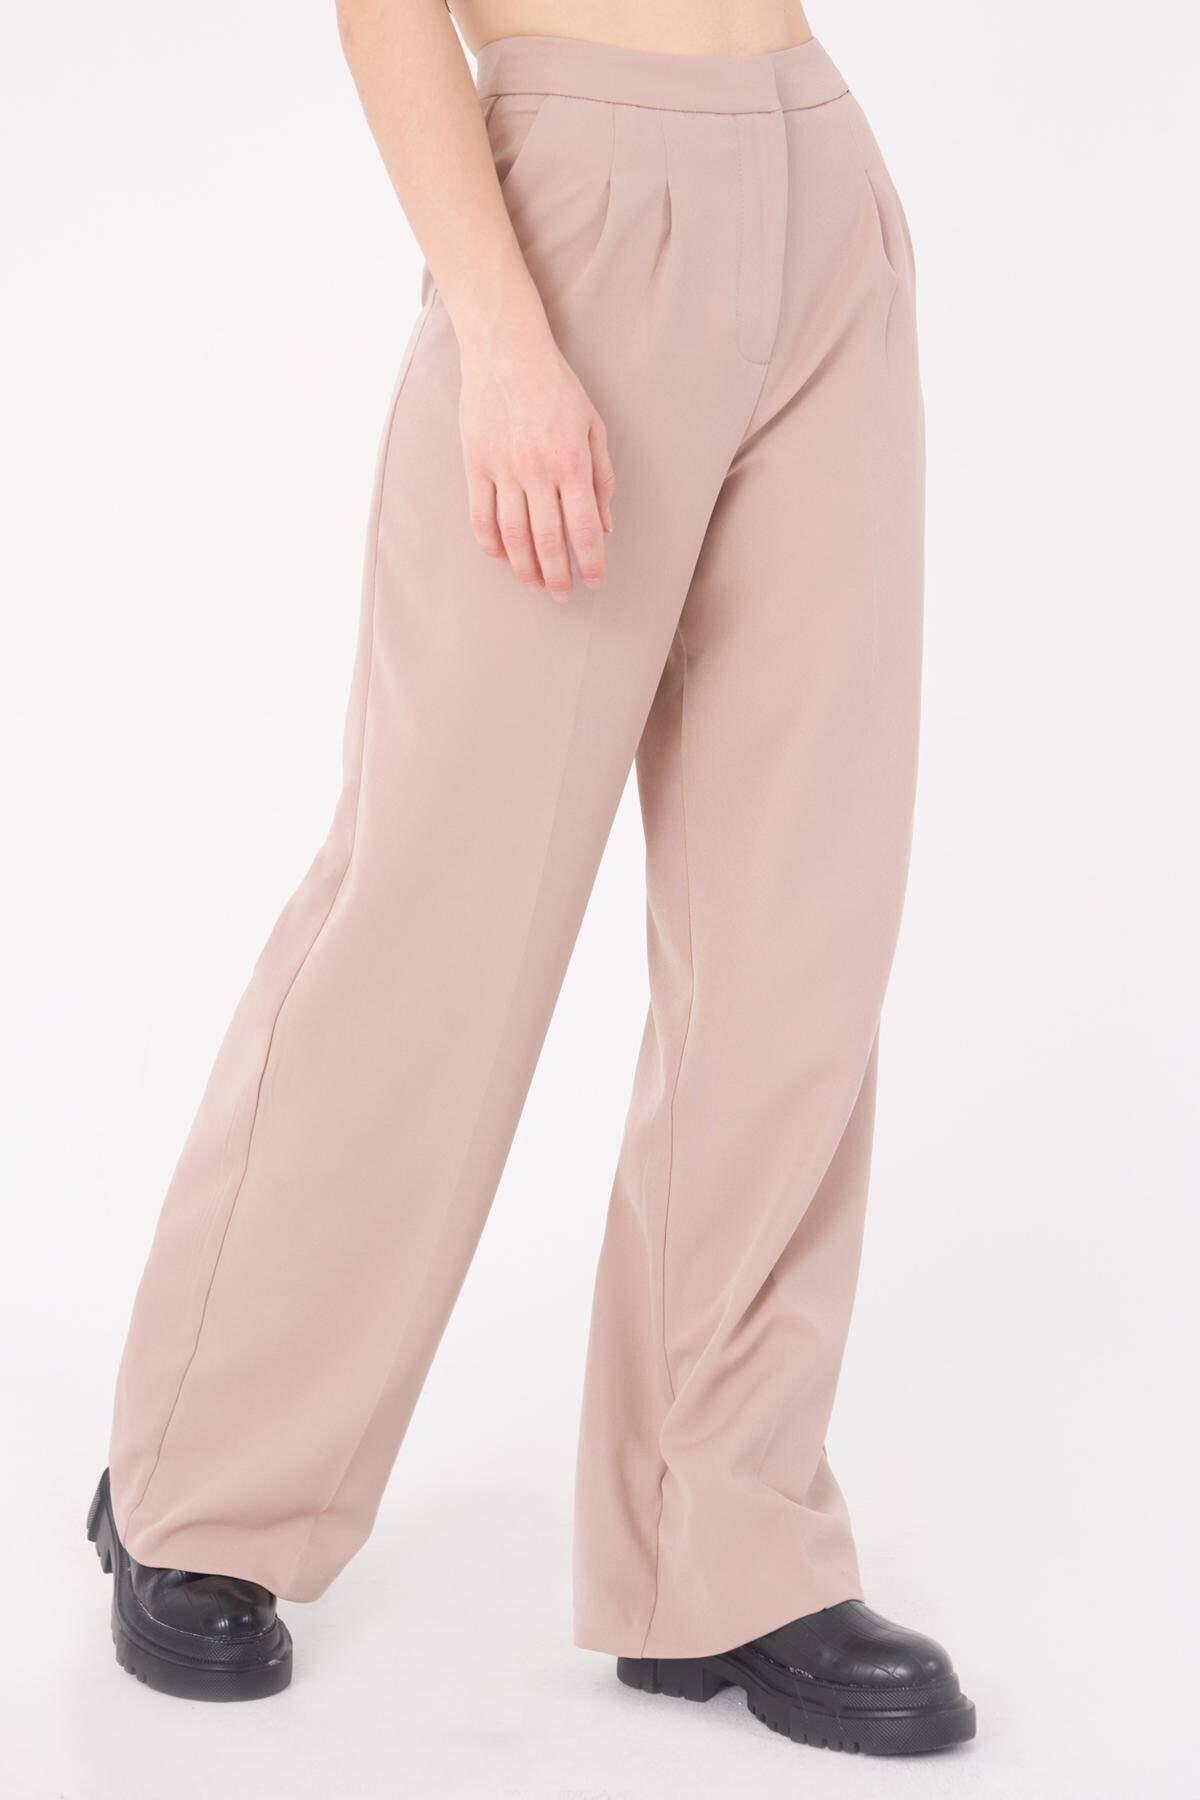 Addax Kadın Bej Cep Detaylı Bol Pantolon PN8058 - E8 ADX-0000023058 3